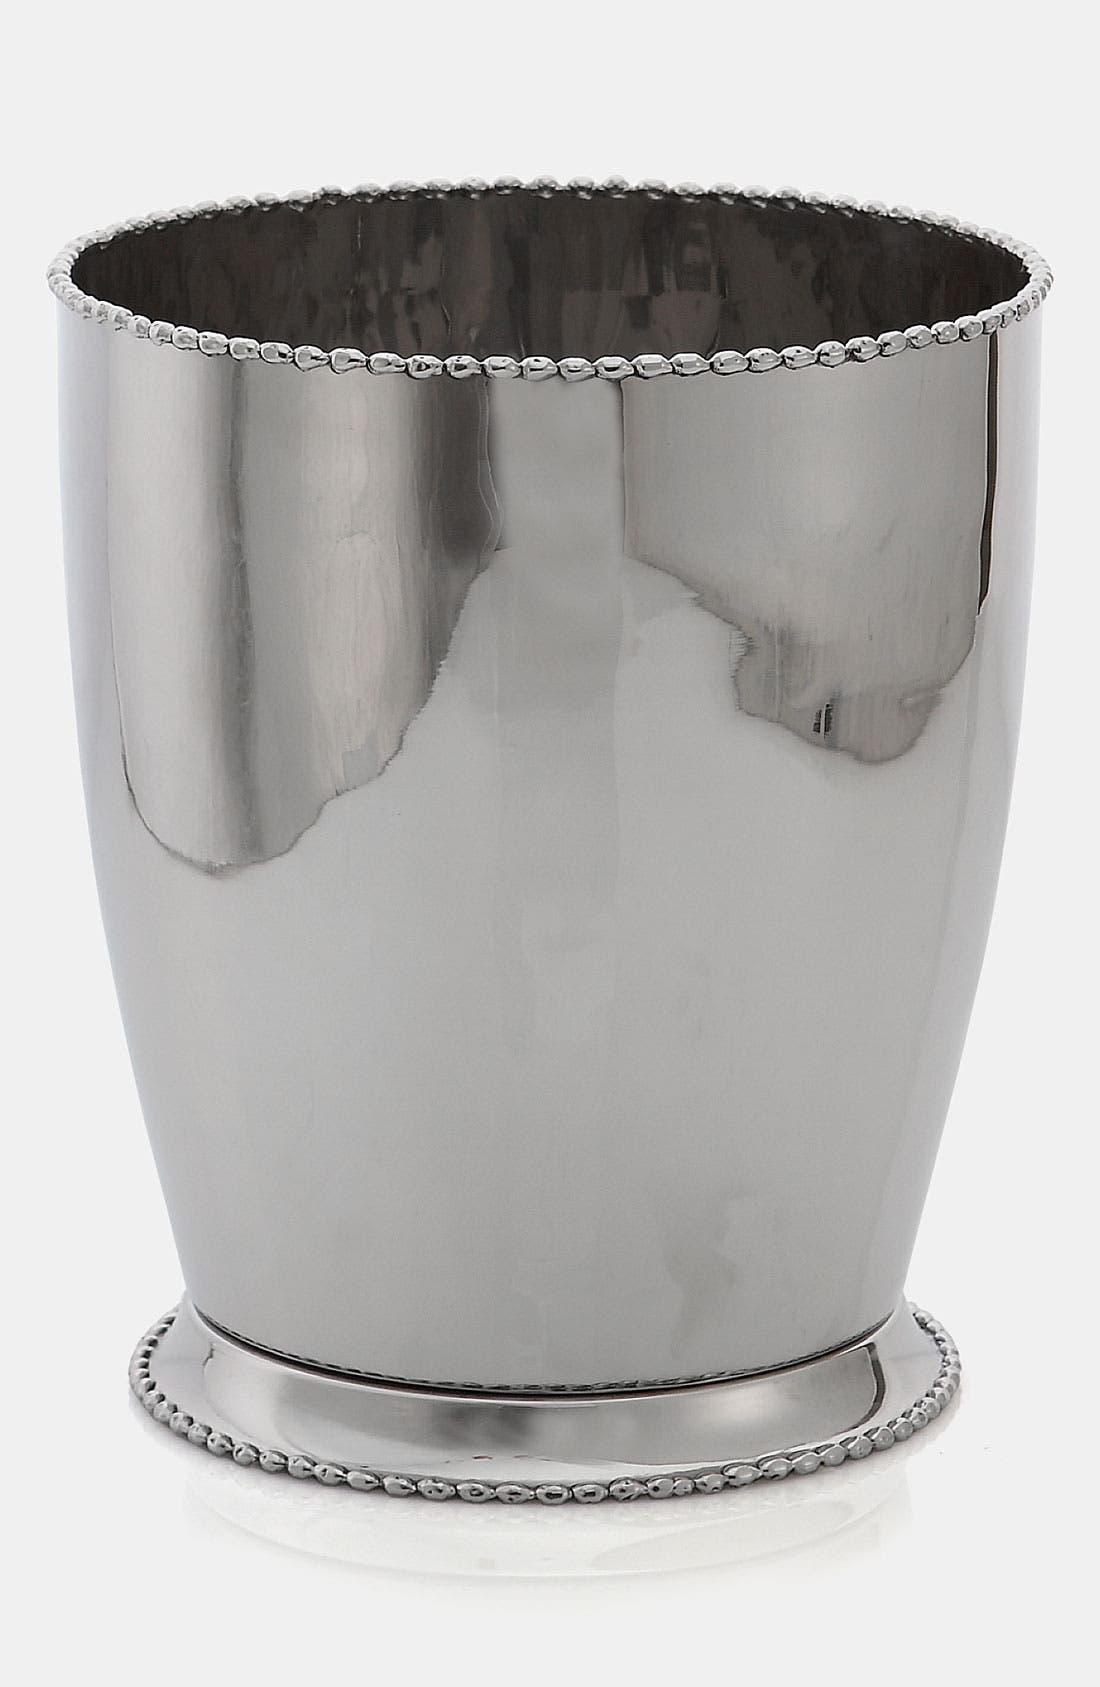 Alternate Image 1 Selected - Michael Aram 'New Molten' Wastebasket